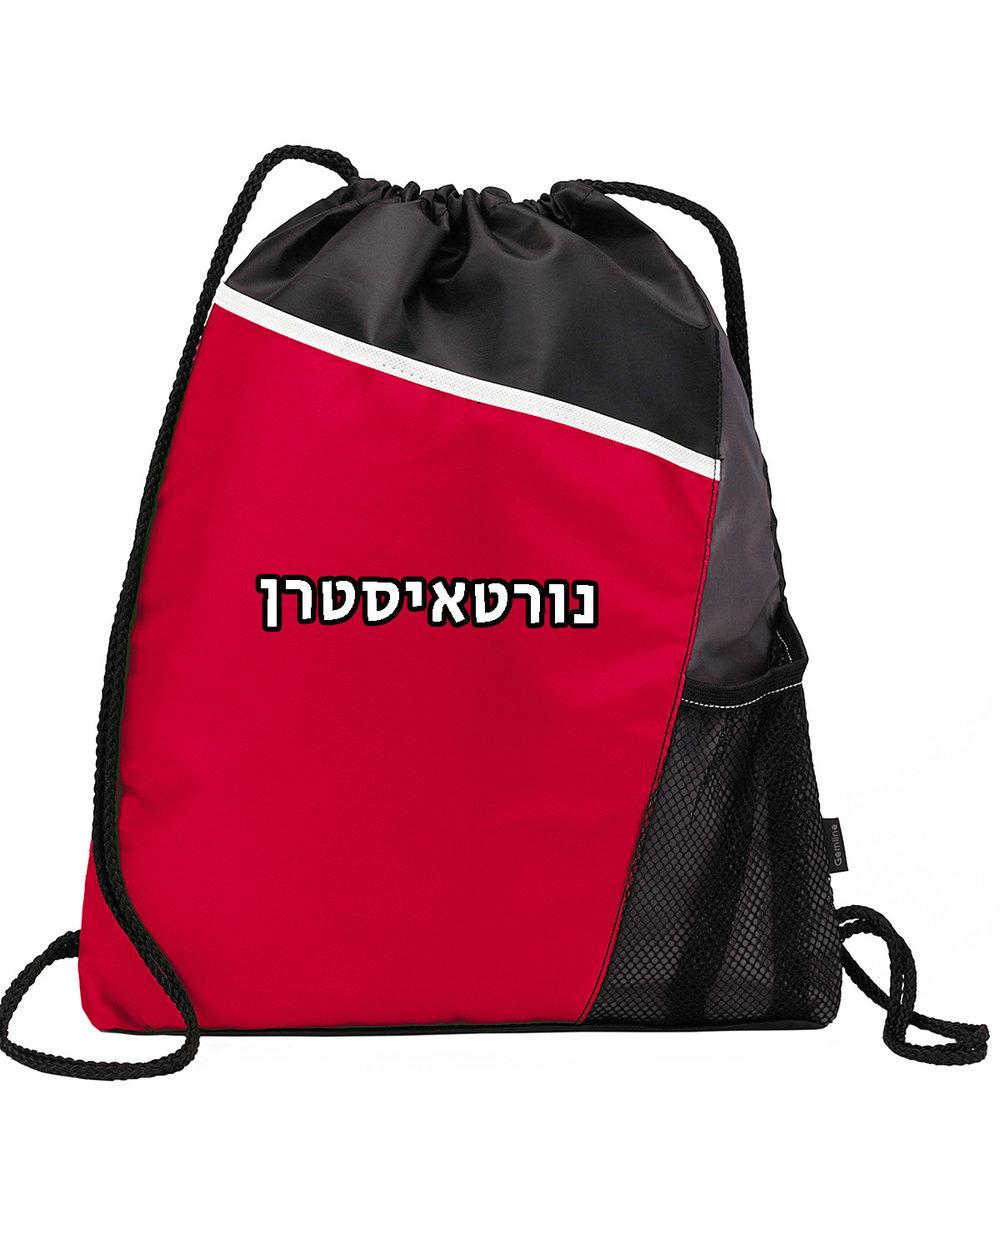 NOrtheastern Backpack.jpg